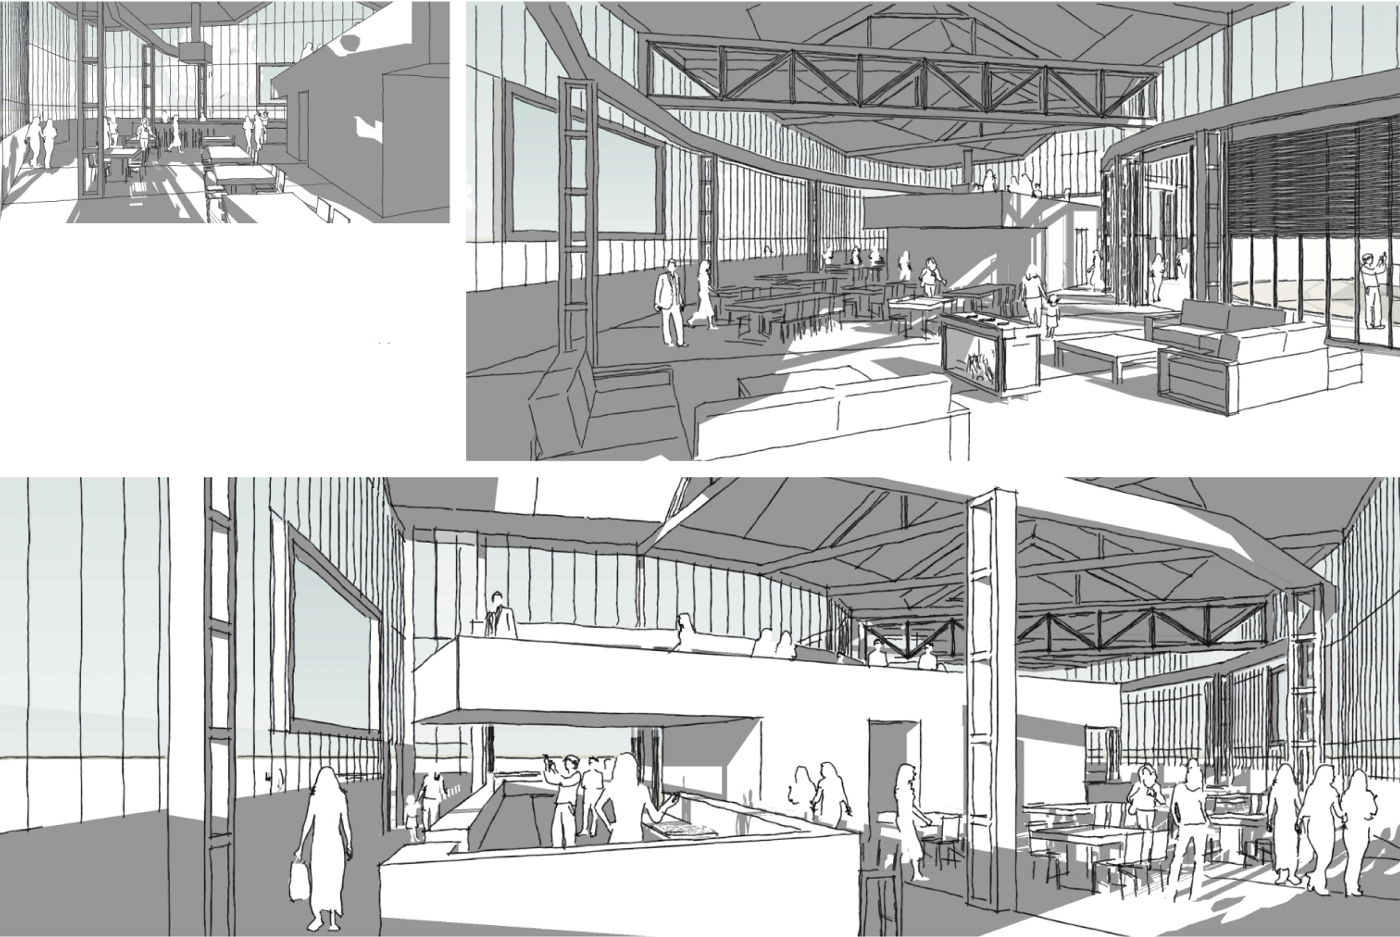 http://www.studioslotboom.nl/wp-content/uploads/2014/10/Invulling-polygonaal-loods-Tilburg-interieur.jpg